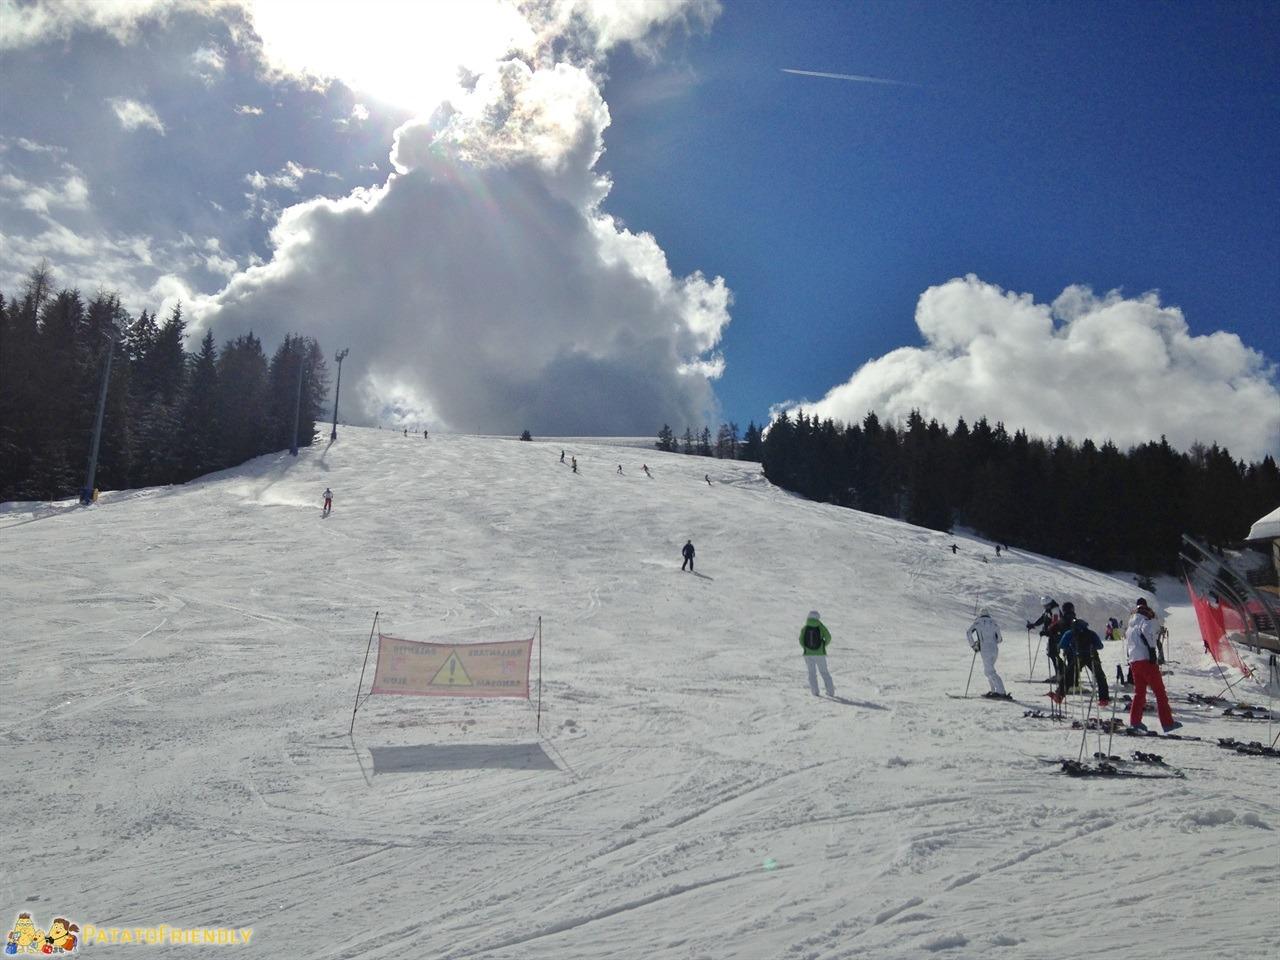 [cml_media_alt id='6297']Monte Pora - Le piste da sci[/cml_media_alt]